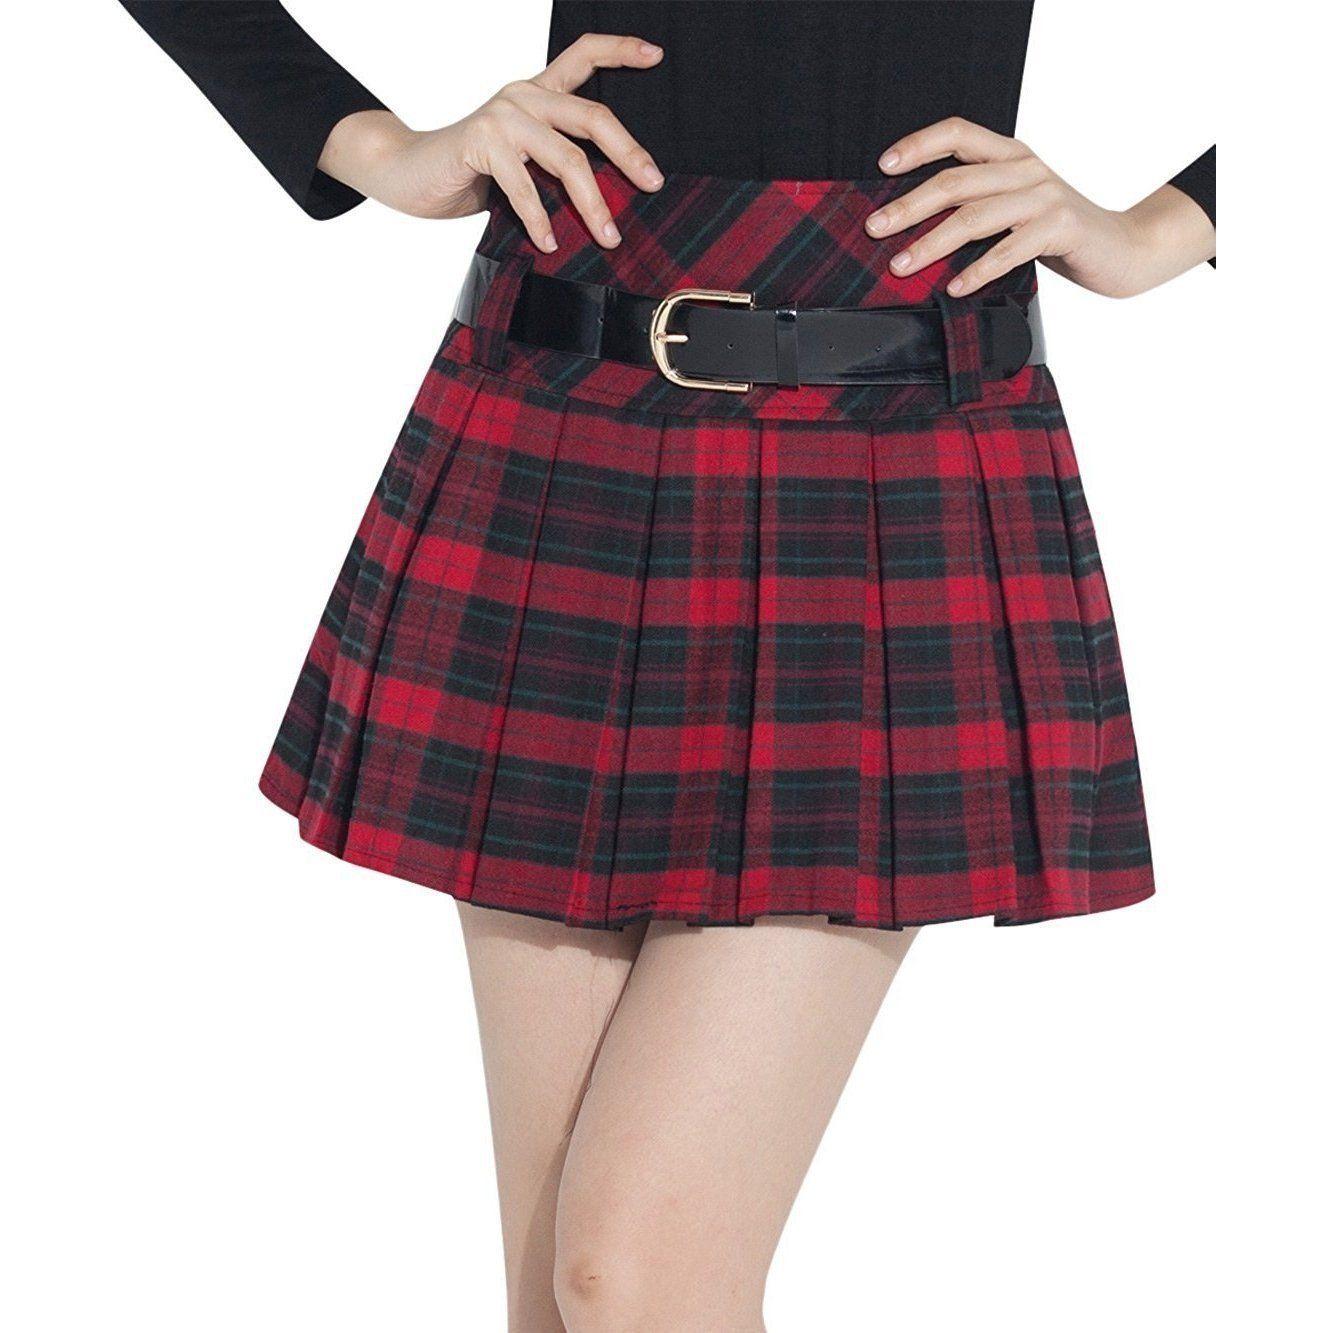 b485a979aa Women's Sexy Red & Black Plaid Catholic School Girl Pleated Mini Skirt